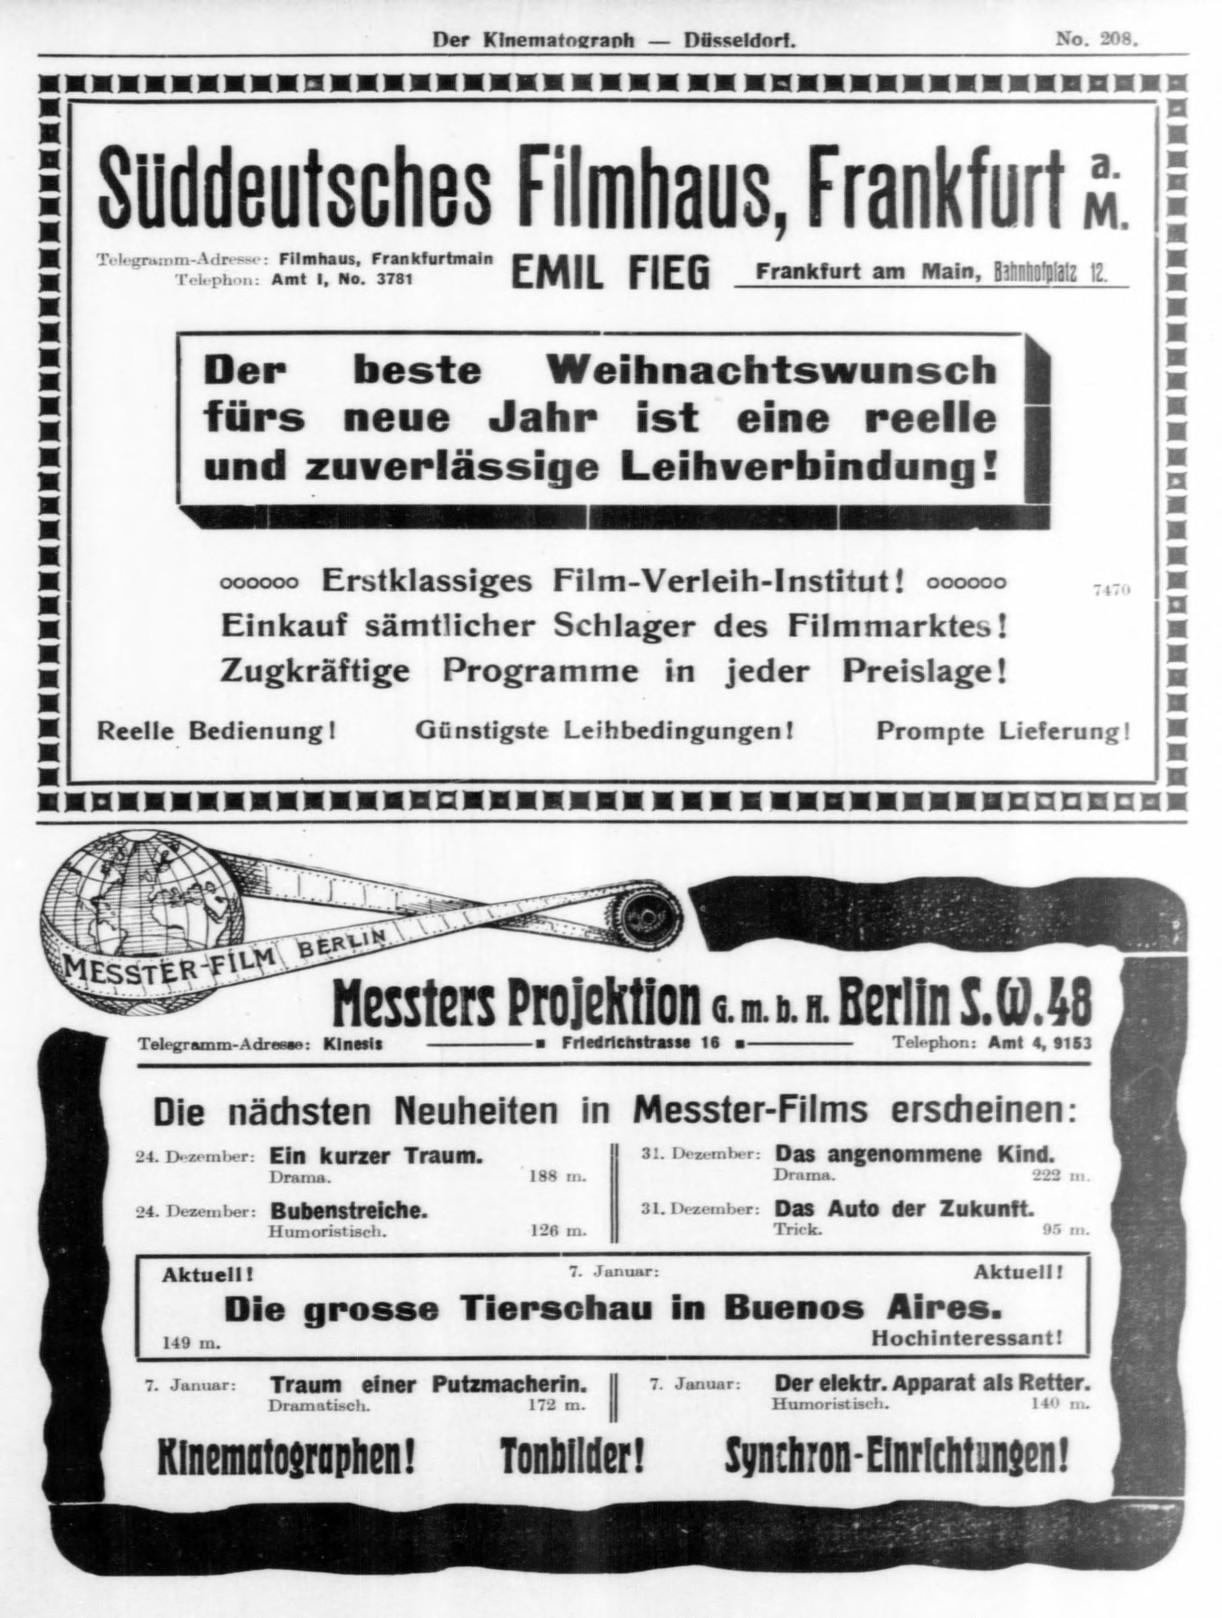 Kinematograph04-1910-12_jp2.zip&file=kinematograph04-1910-12_jp2%2fkinematograph04-1910-12_0070